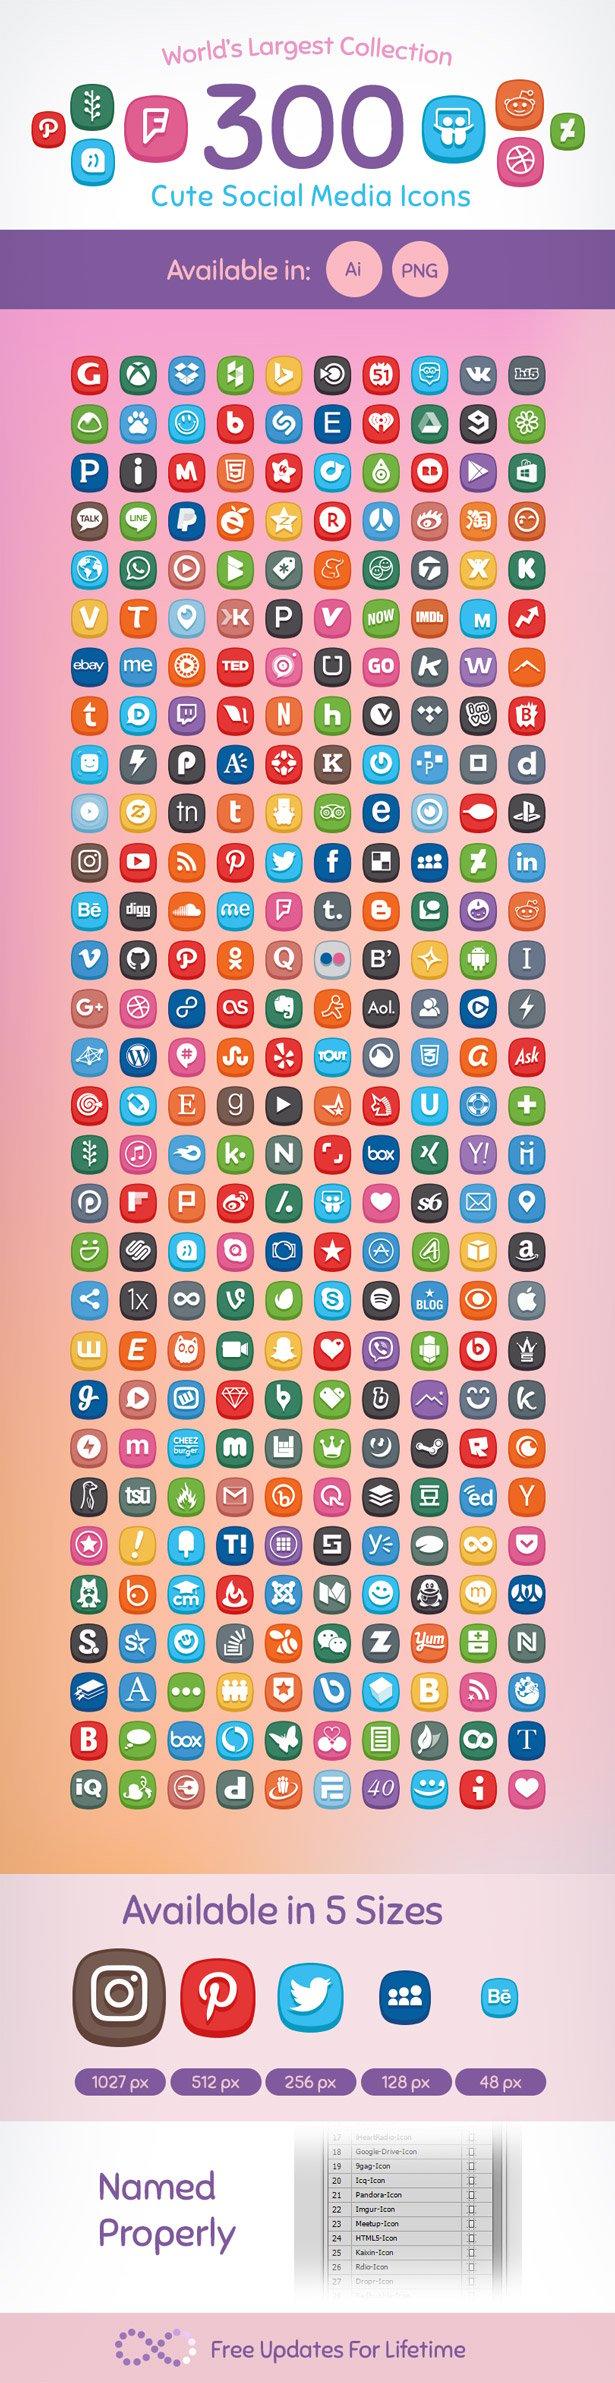 Premium-300-Cute-Social-Media-Icons-set